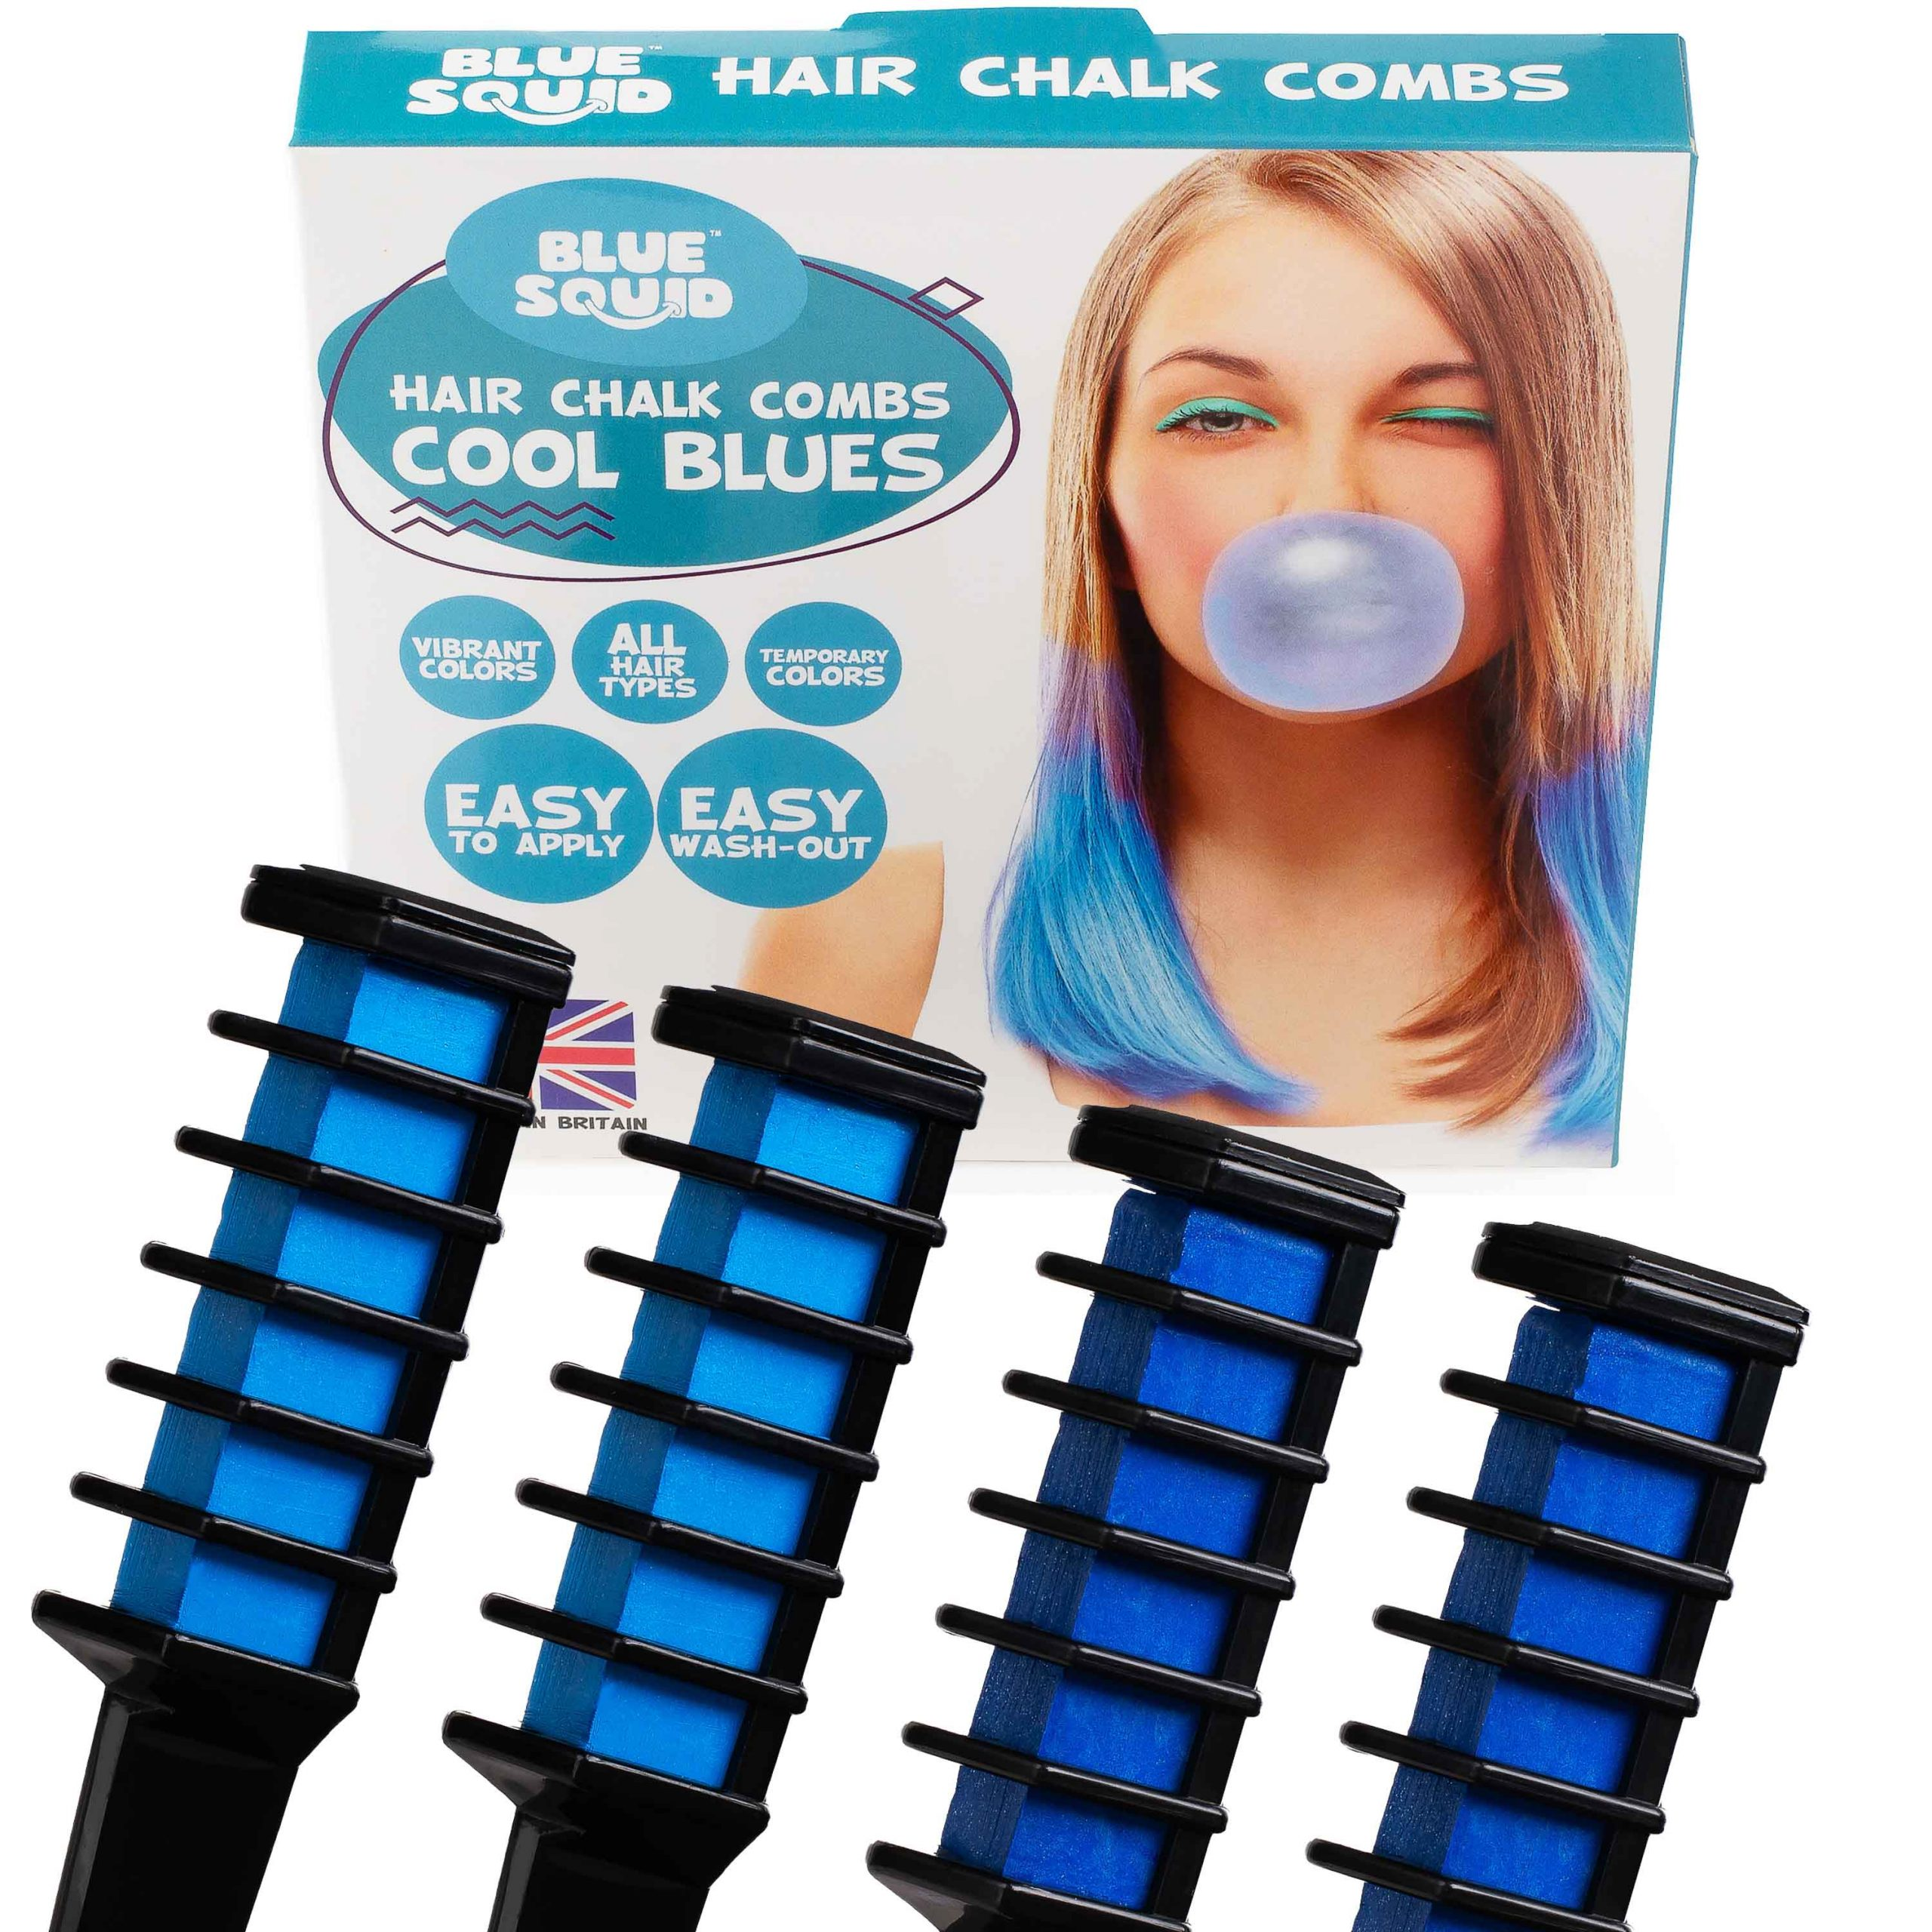 Cool Blues Hair Chalk Combs